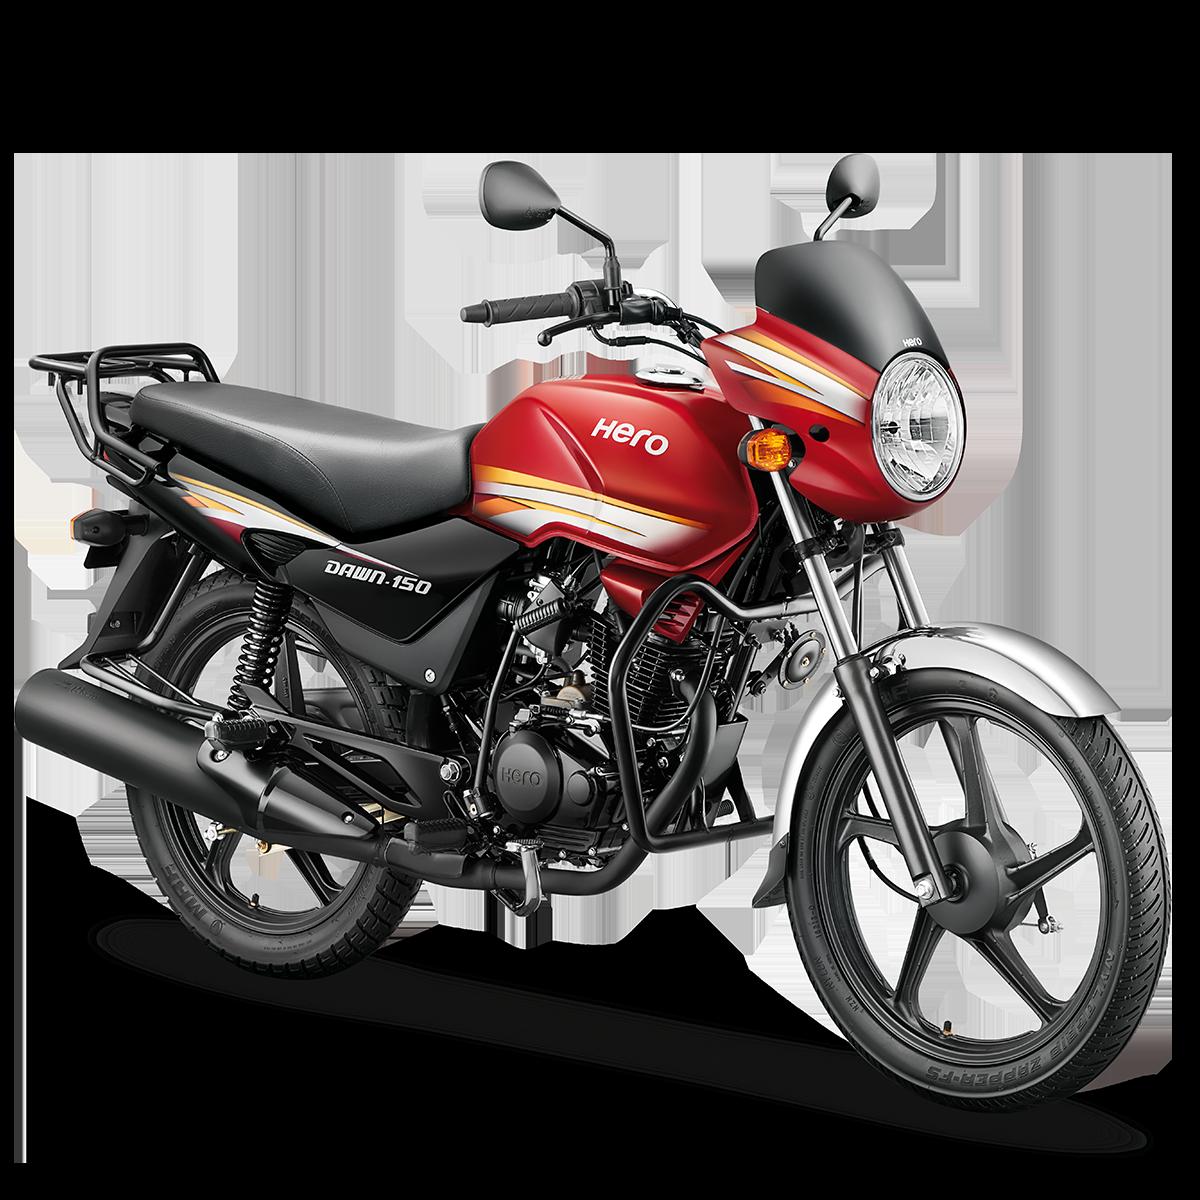 DAWN 150 - Motor: 150cc / Potencia: 13.4 bhpPrecio: $1,300.00